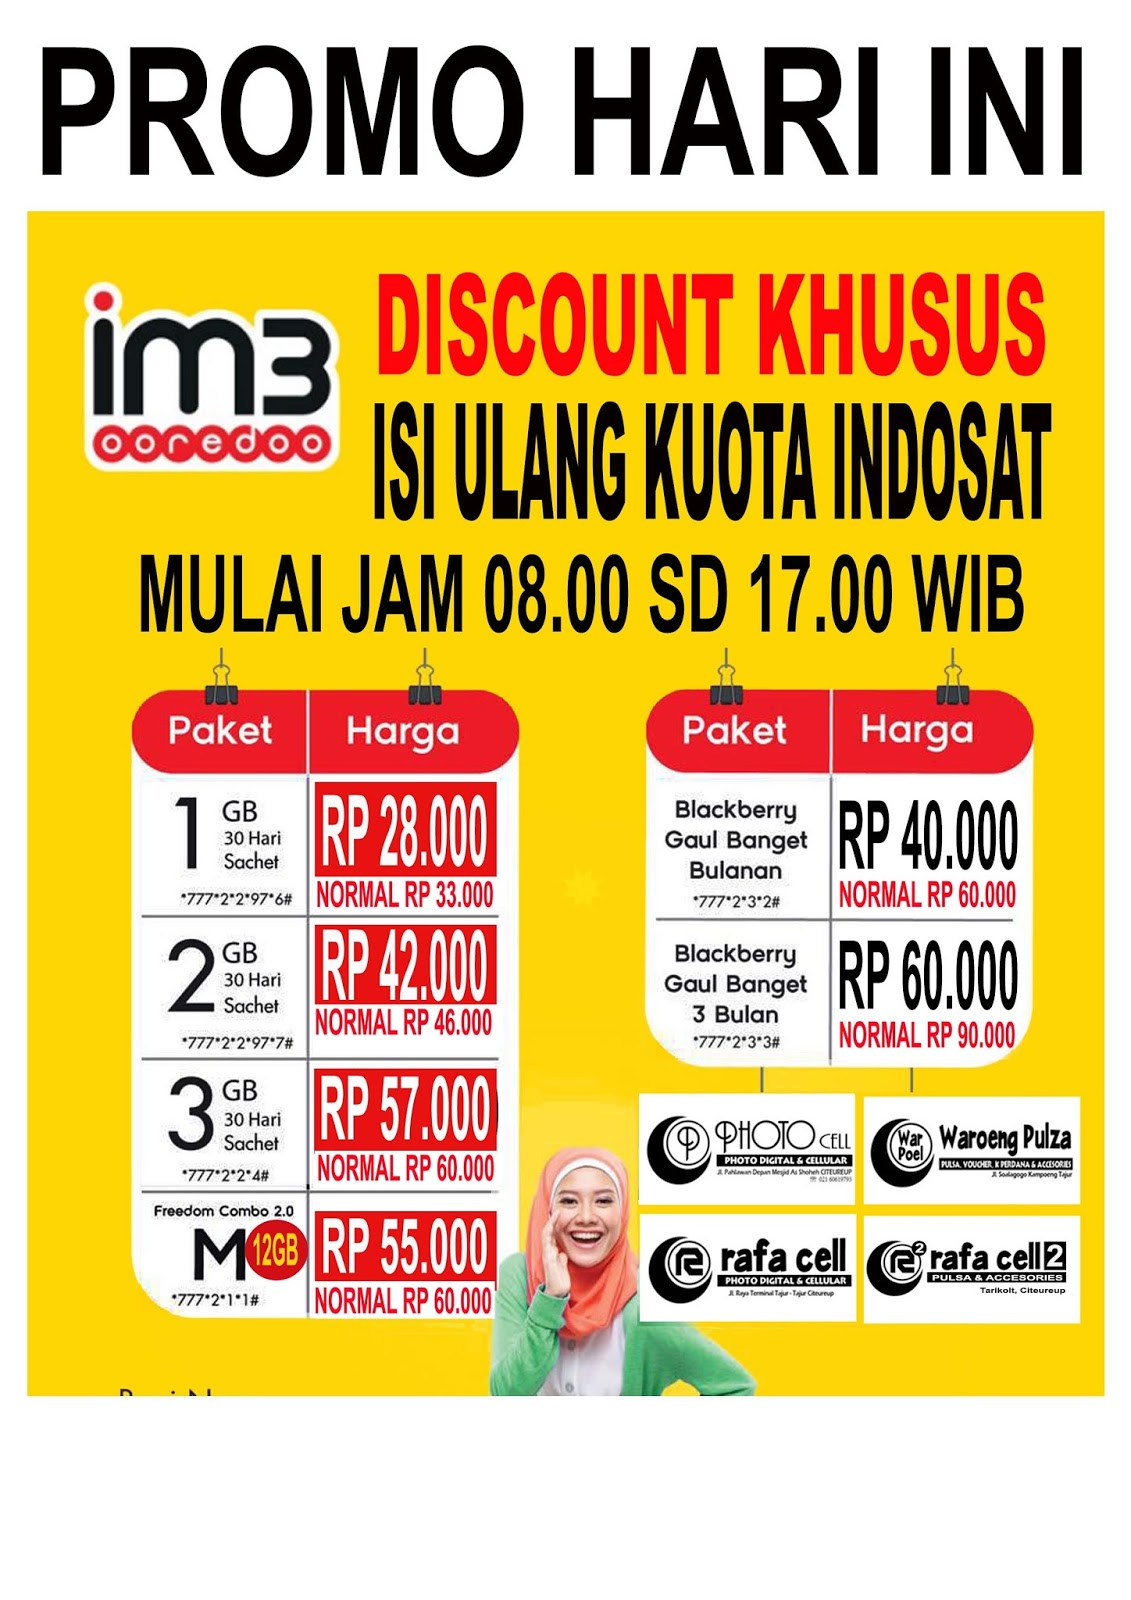 Photo Cell Citeureup Promo Isi Ulang Kuota Indosat Freedom Combo 12gb 1gb 28rb 2gb 42000 M 57000 Tlp Sms Unlimited Paketbb 1bln 40rb 3bln 60000 Berlaku Hari Senin 15 Agustus